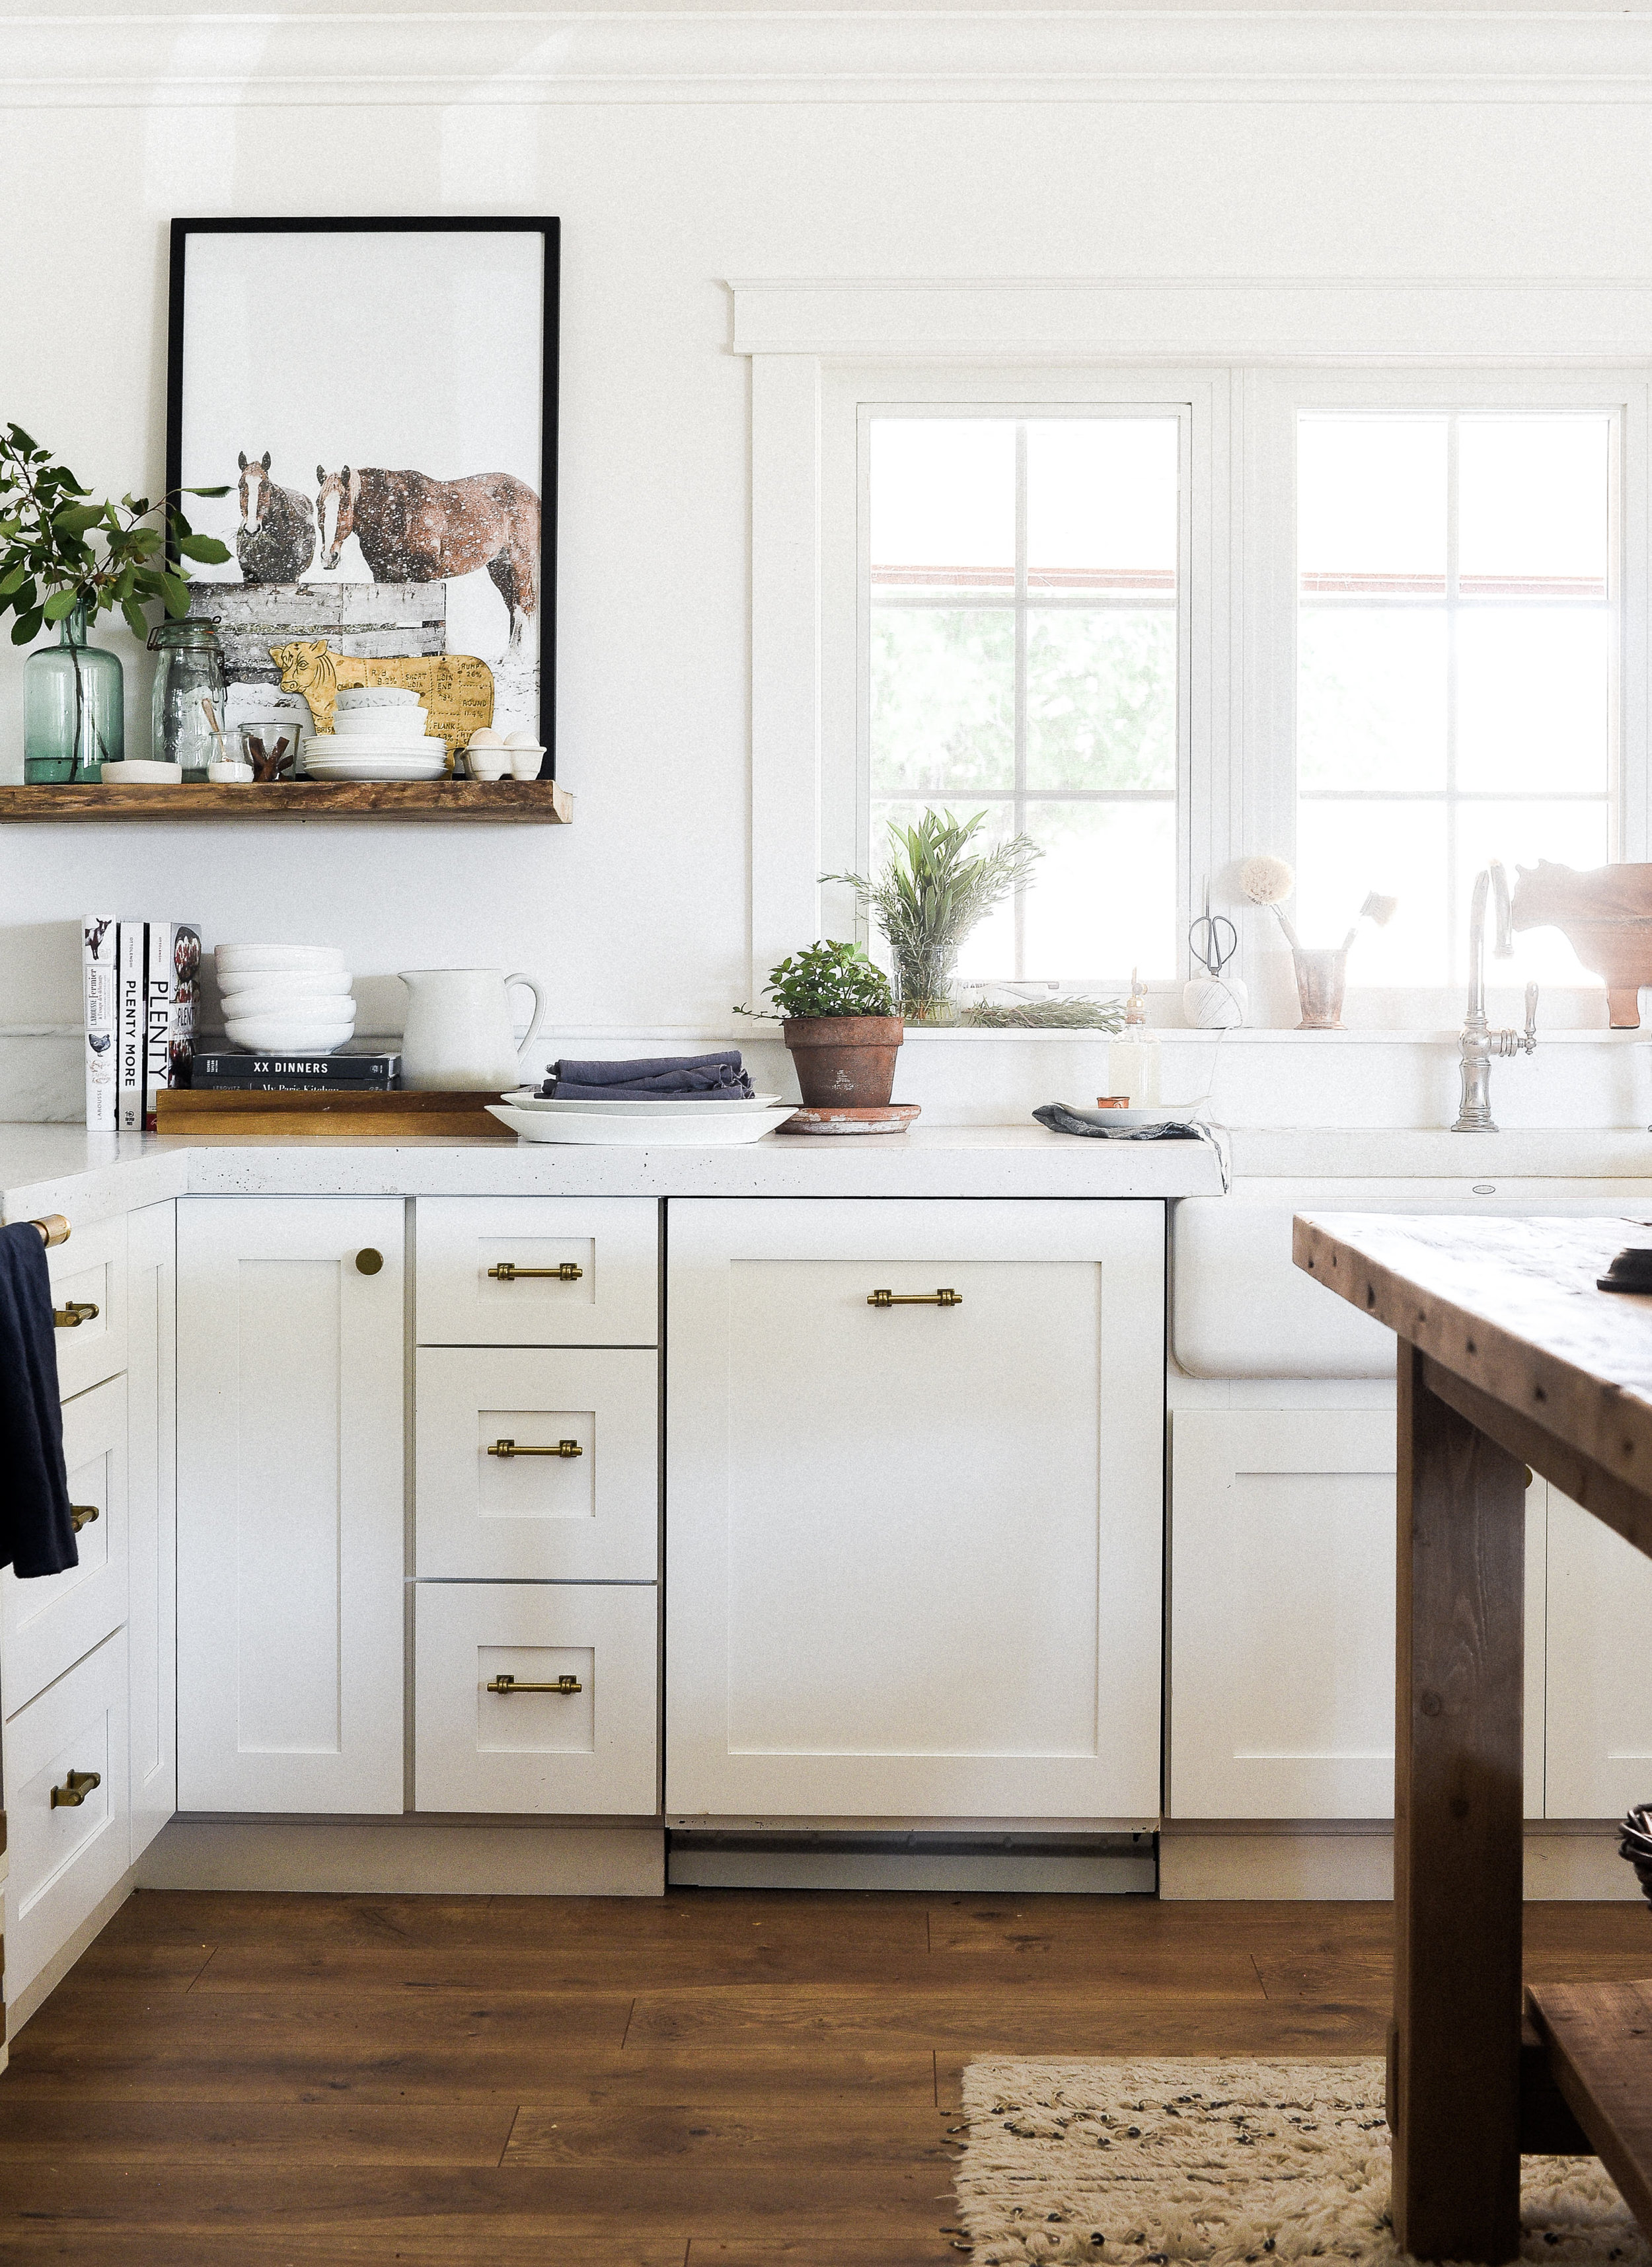 White modern farmhouse kitchen remodel with wood island | boxwoodavenue.com